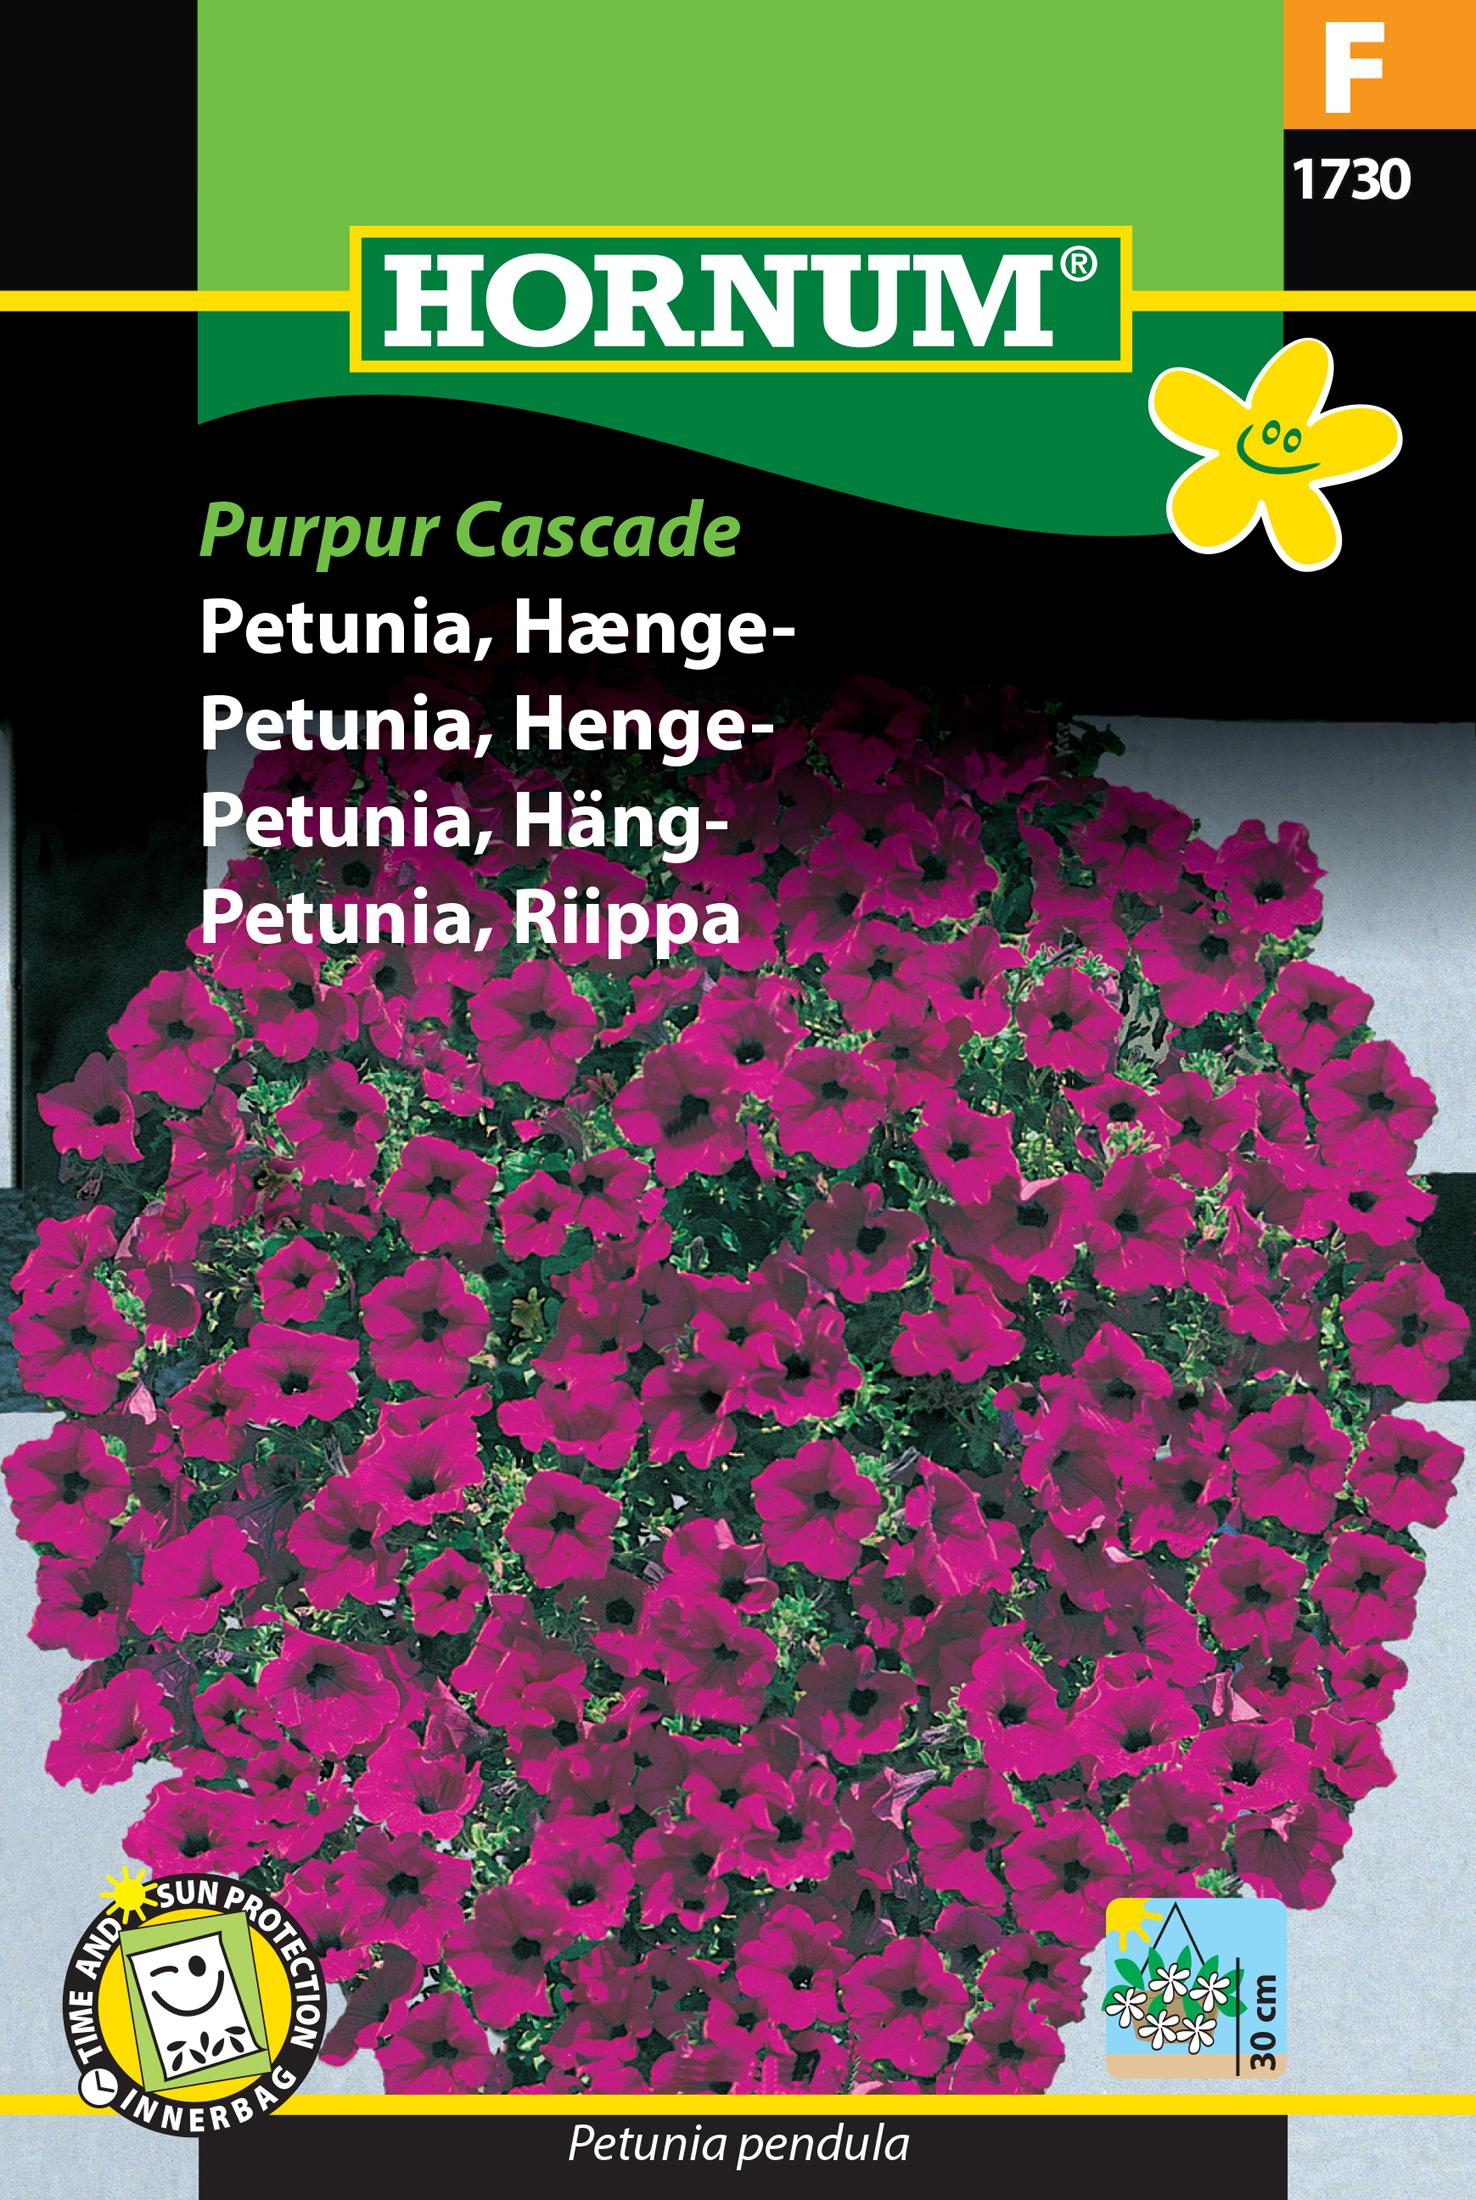 Petunia, Häng- 'Purpur Cascade